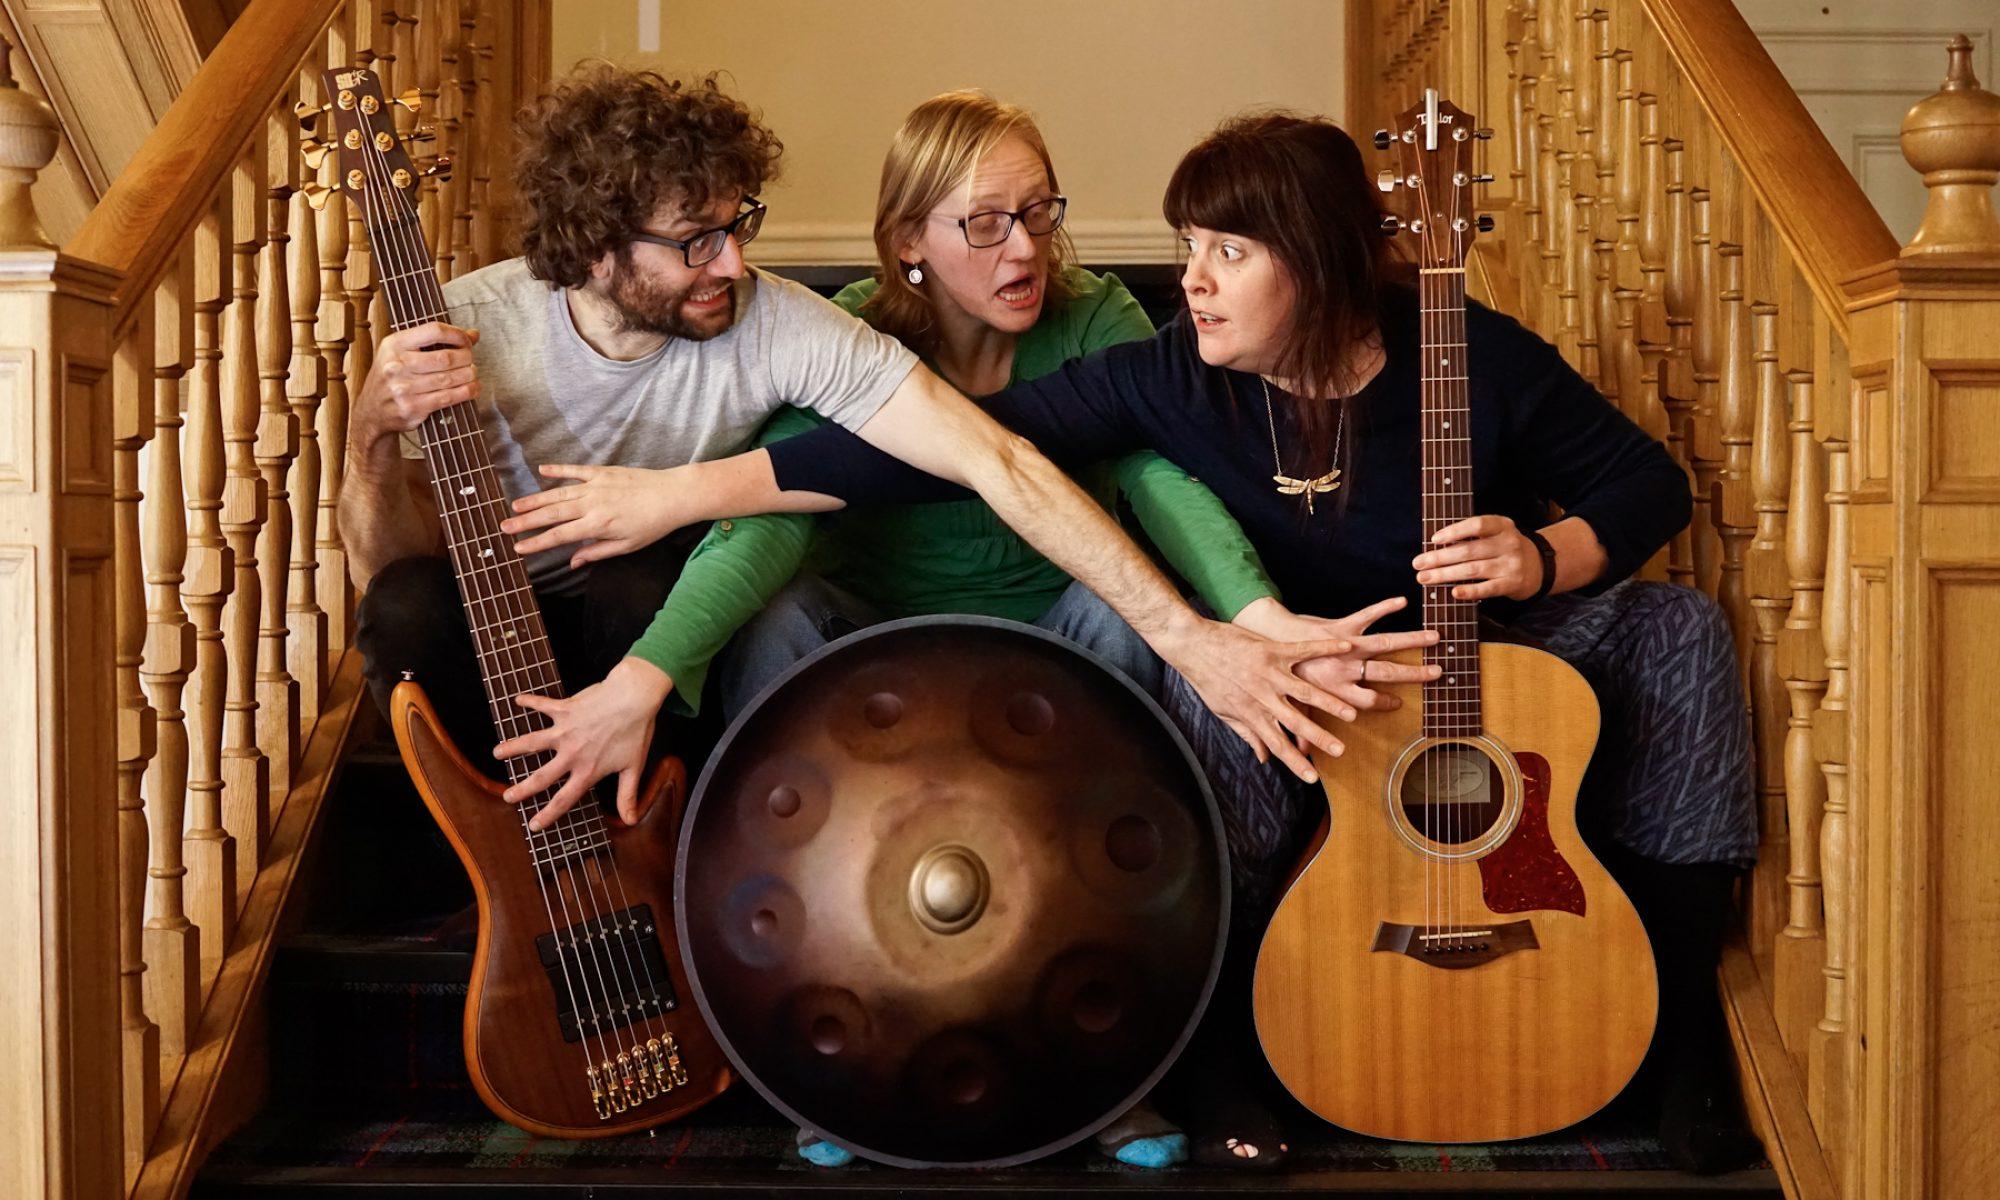 The Enharmonic Collective